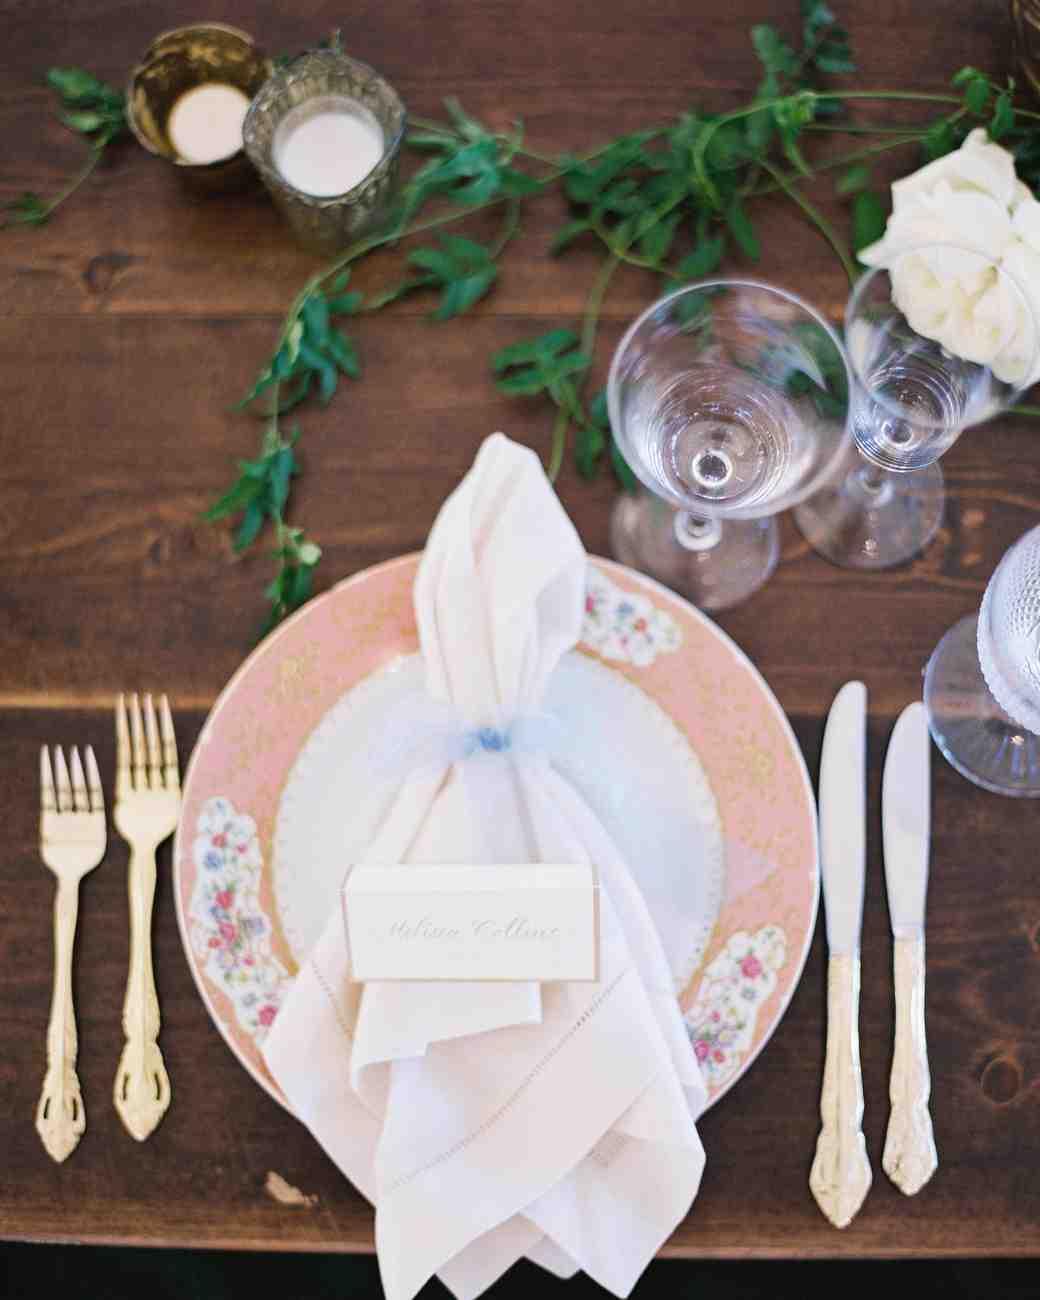 amy-garrison-wedding-placesetting-00752-6134266-0816.jpg